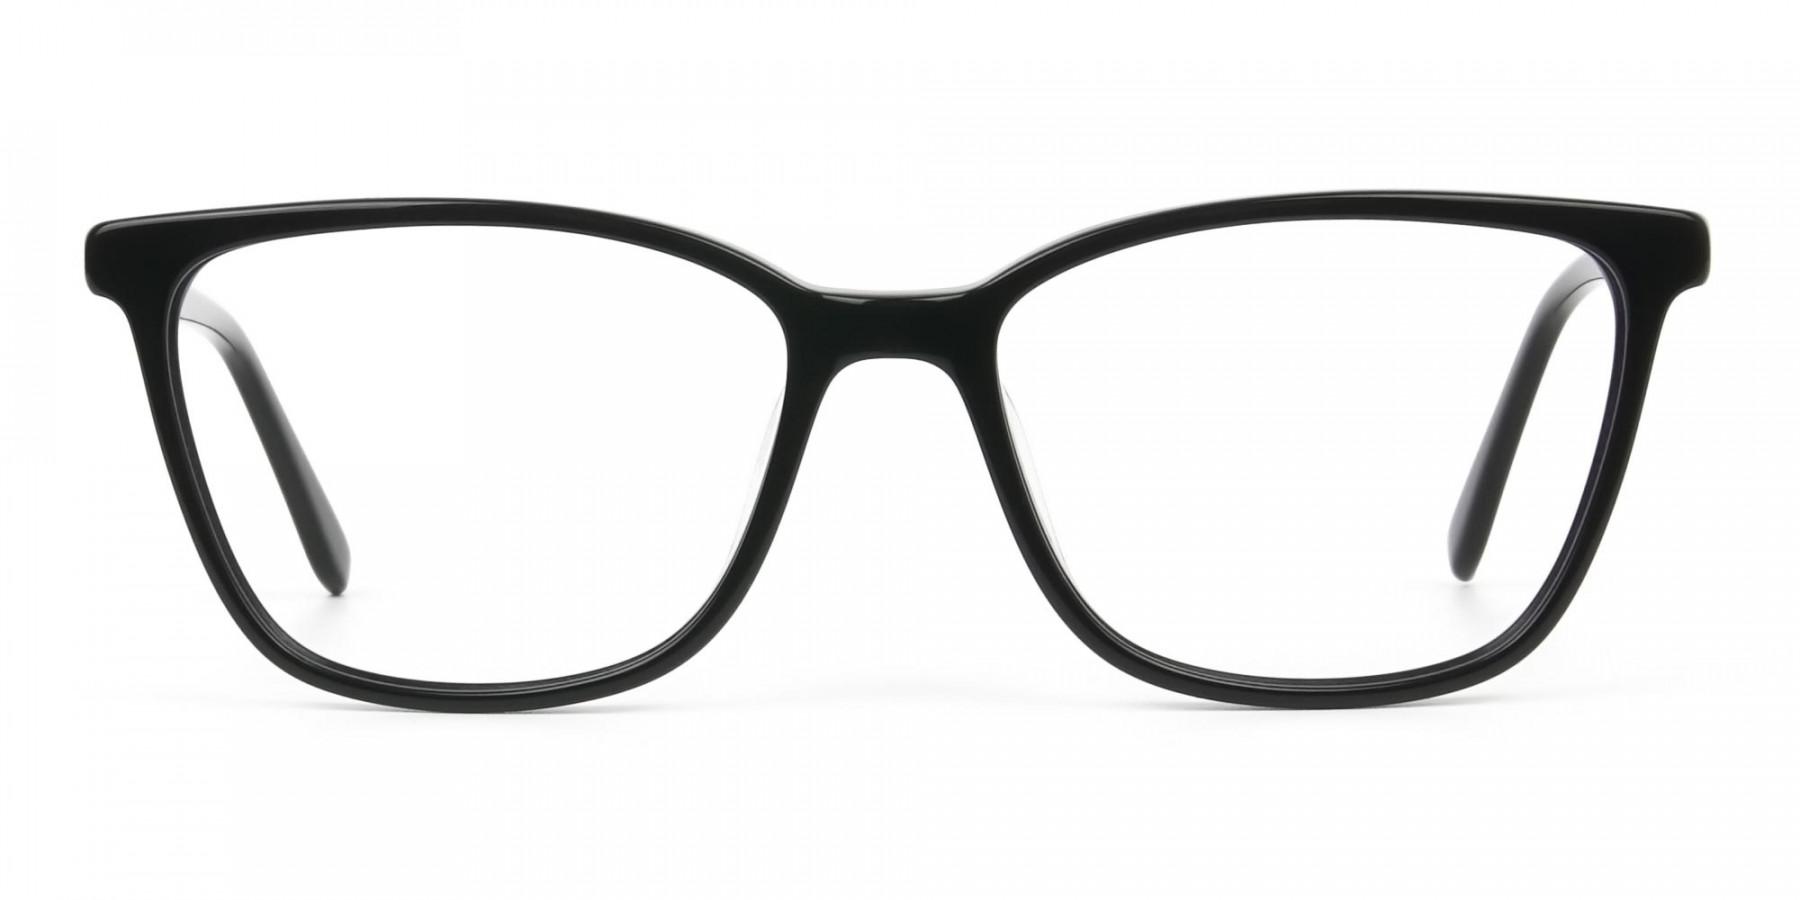 Women Nerd Black Acetate Spectacles in Rectangular - 1